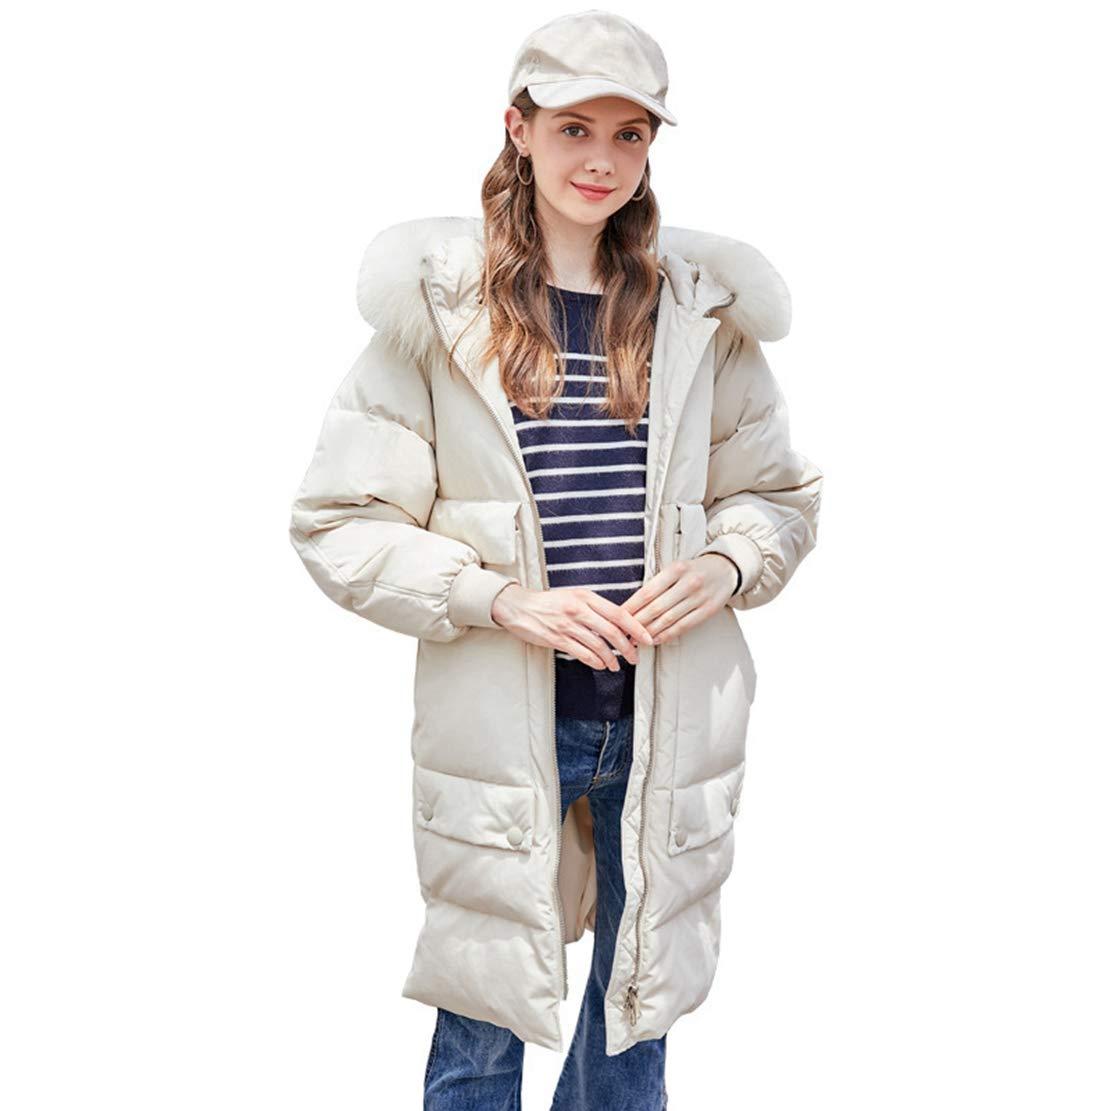 Amazon.com: Nat terry Women Fur Collar Winter Down Coat Jacket Long Warm Casaco Feminino Abrigos Mujer Invierno Outwear Coats: Clothing